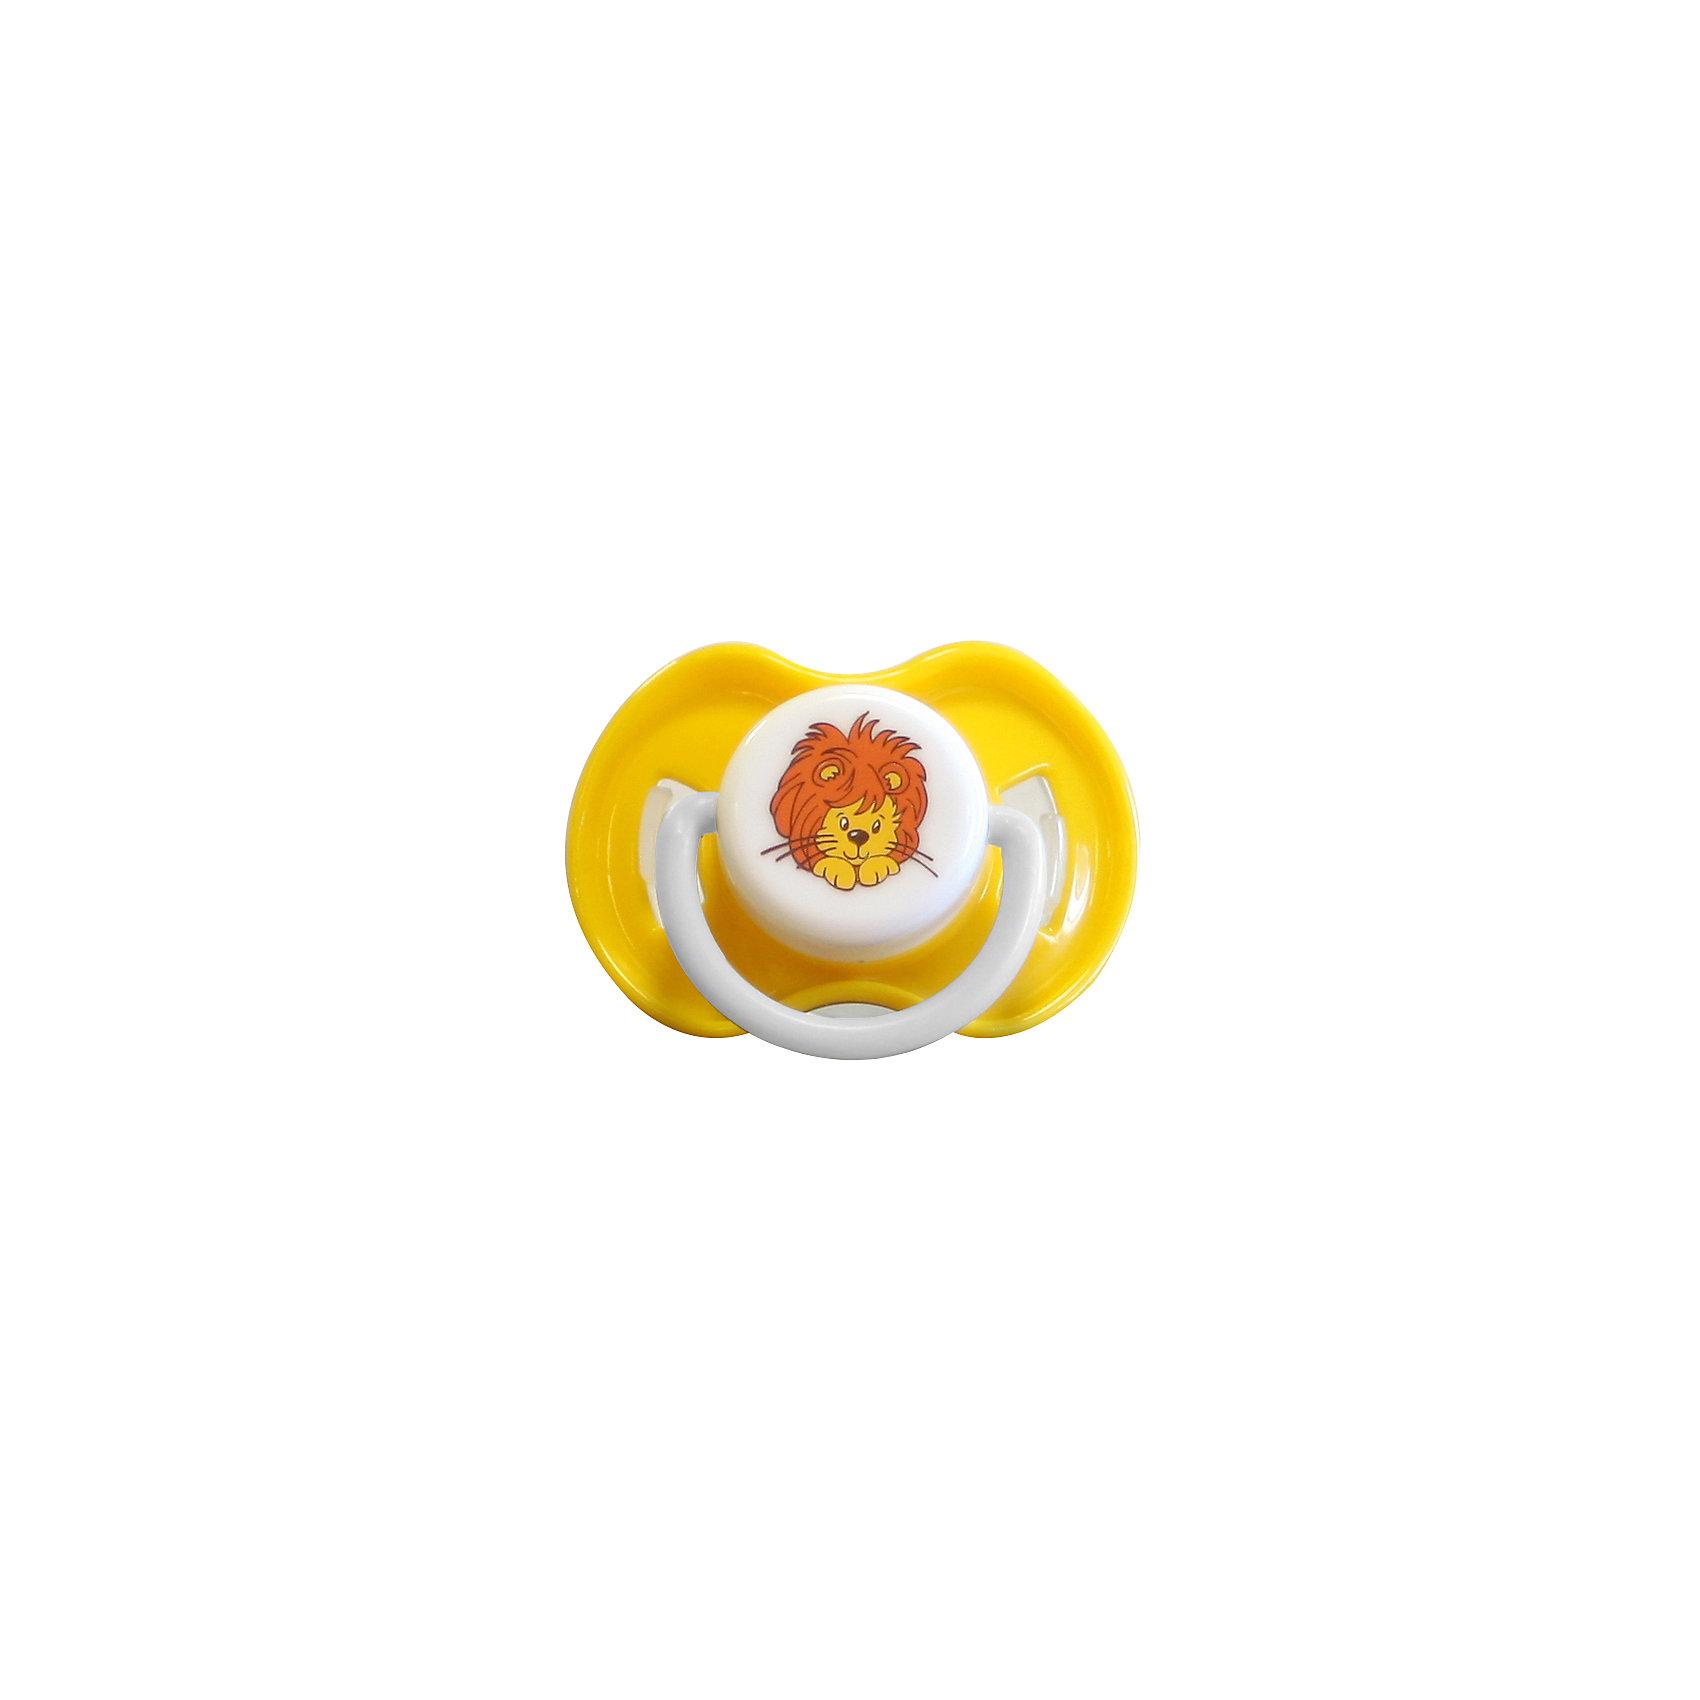 "LUBBY Пустышка латексная ""Веселые животные"" от 6 мес., LUBBY, желтый"